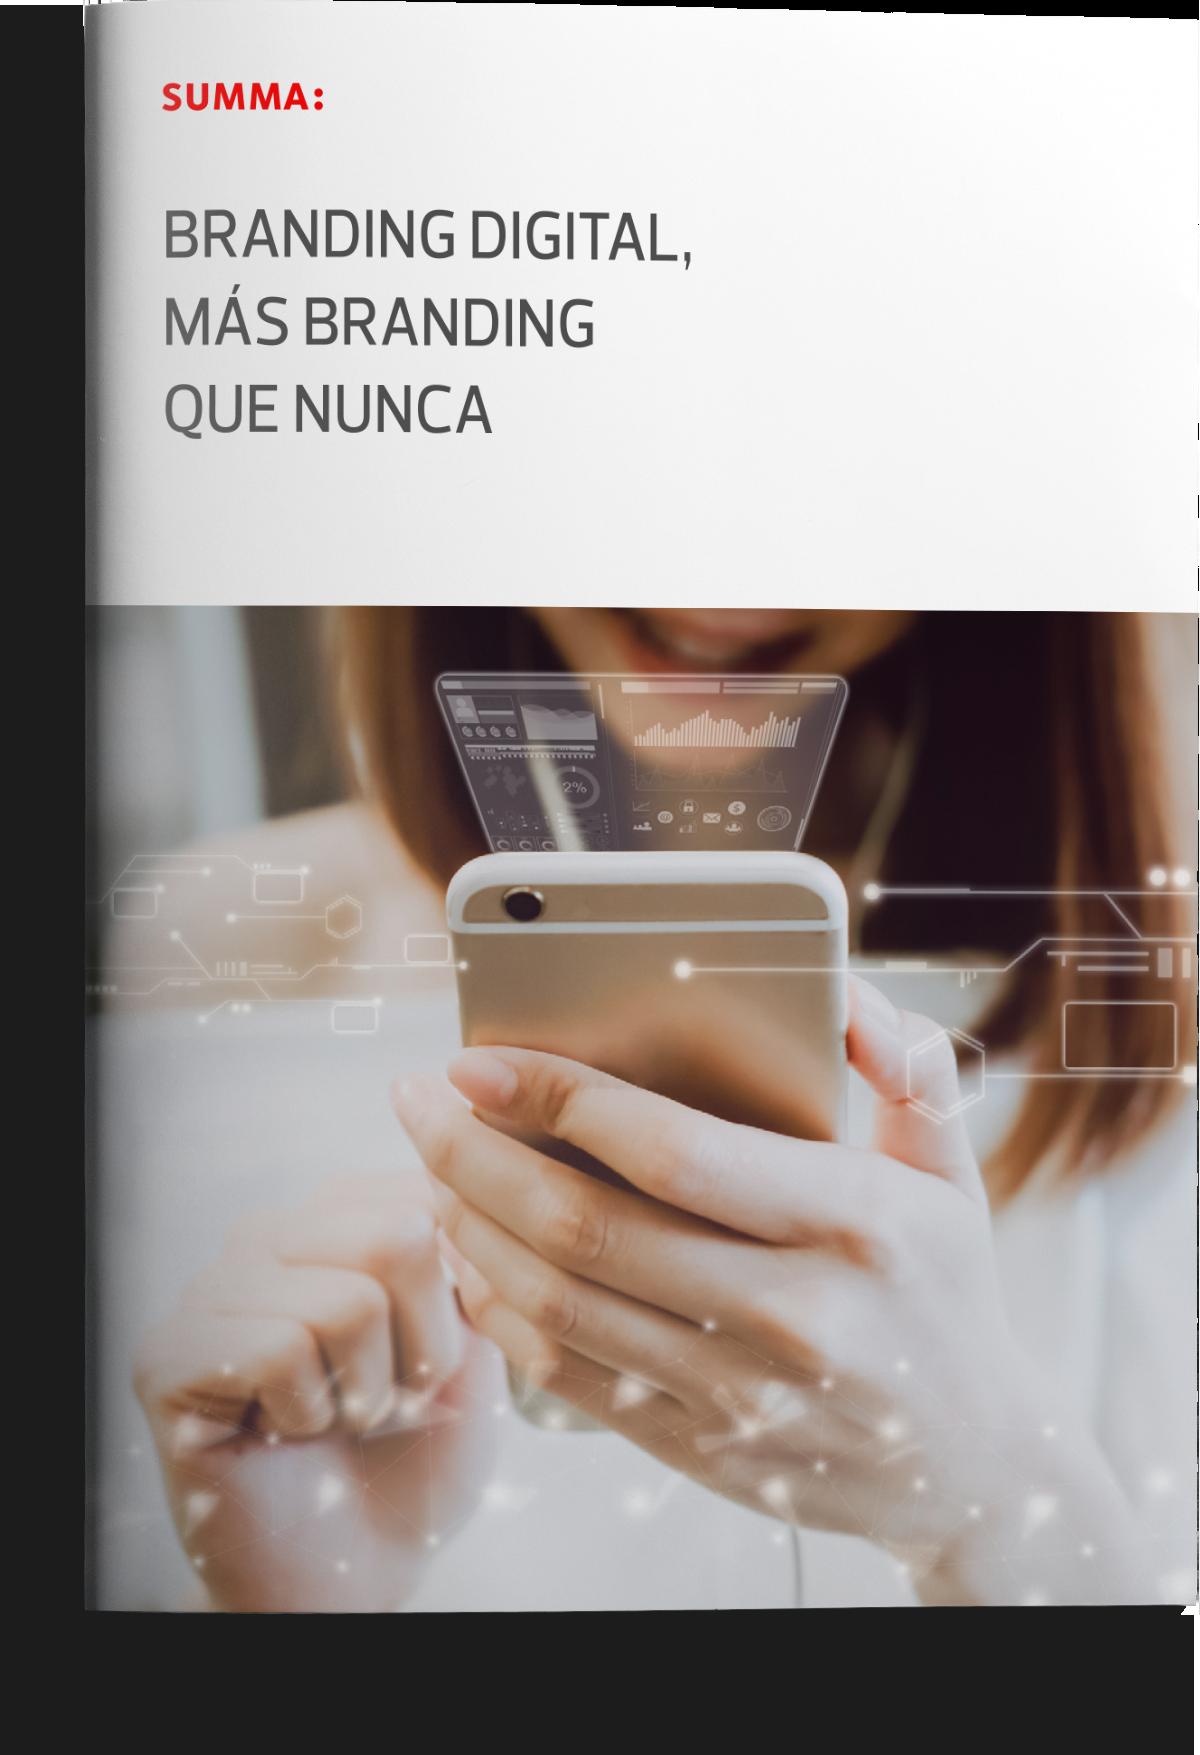 SUM_-_Portada_-_Branding_Digital.png